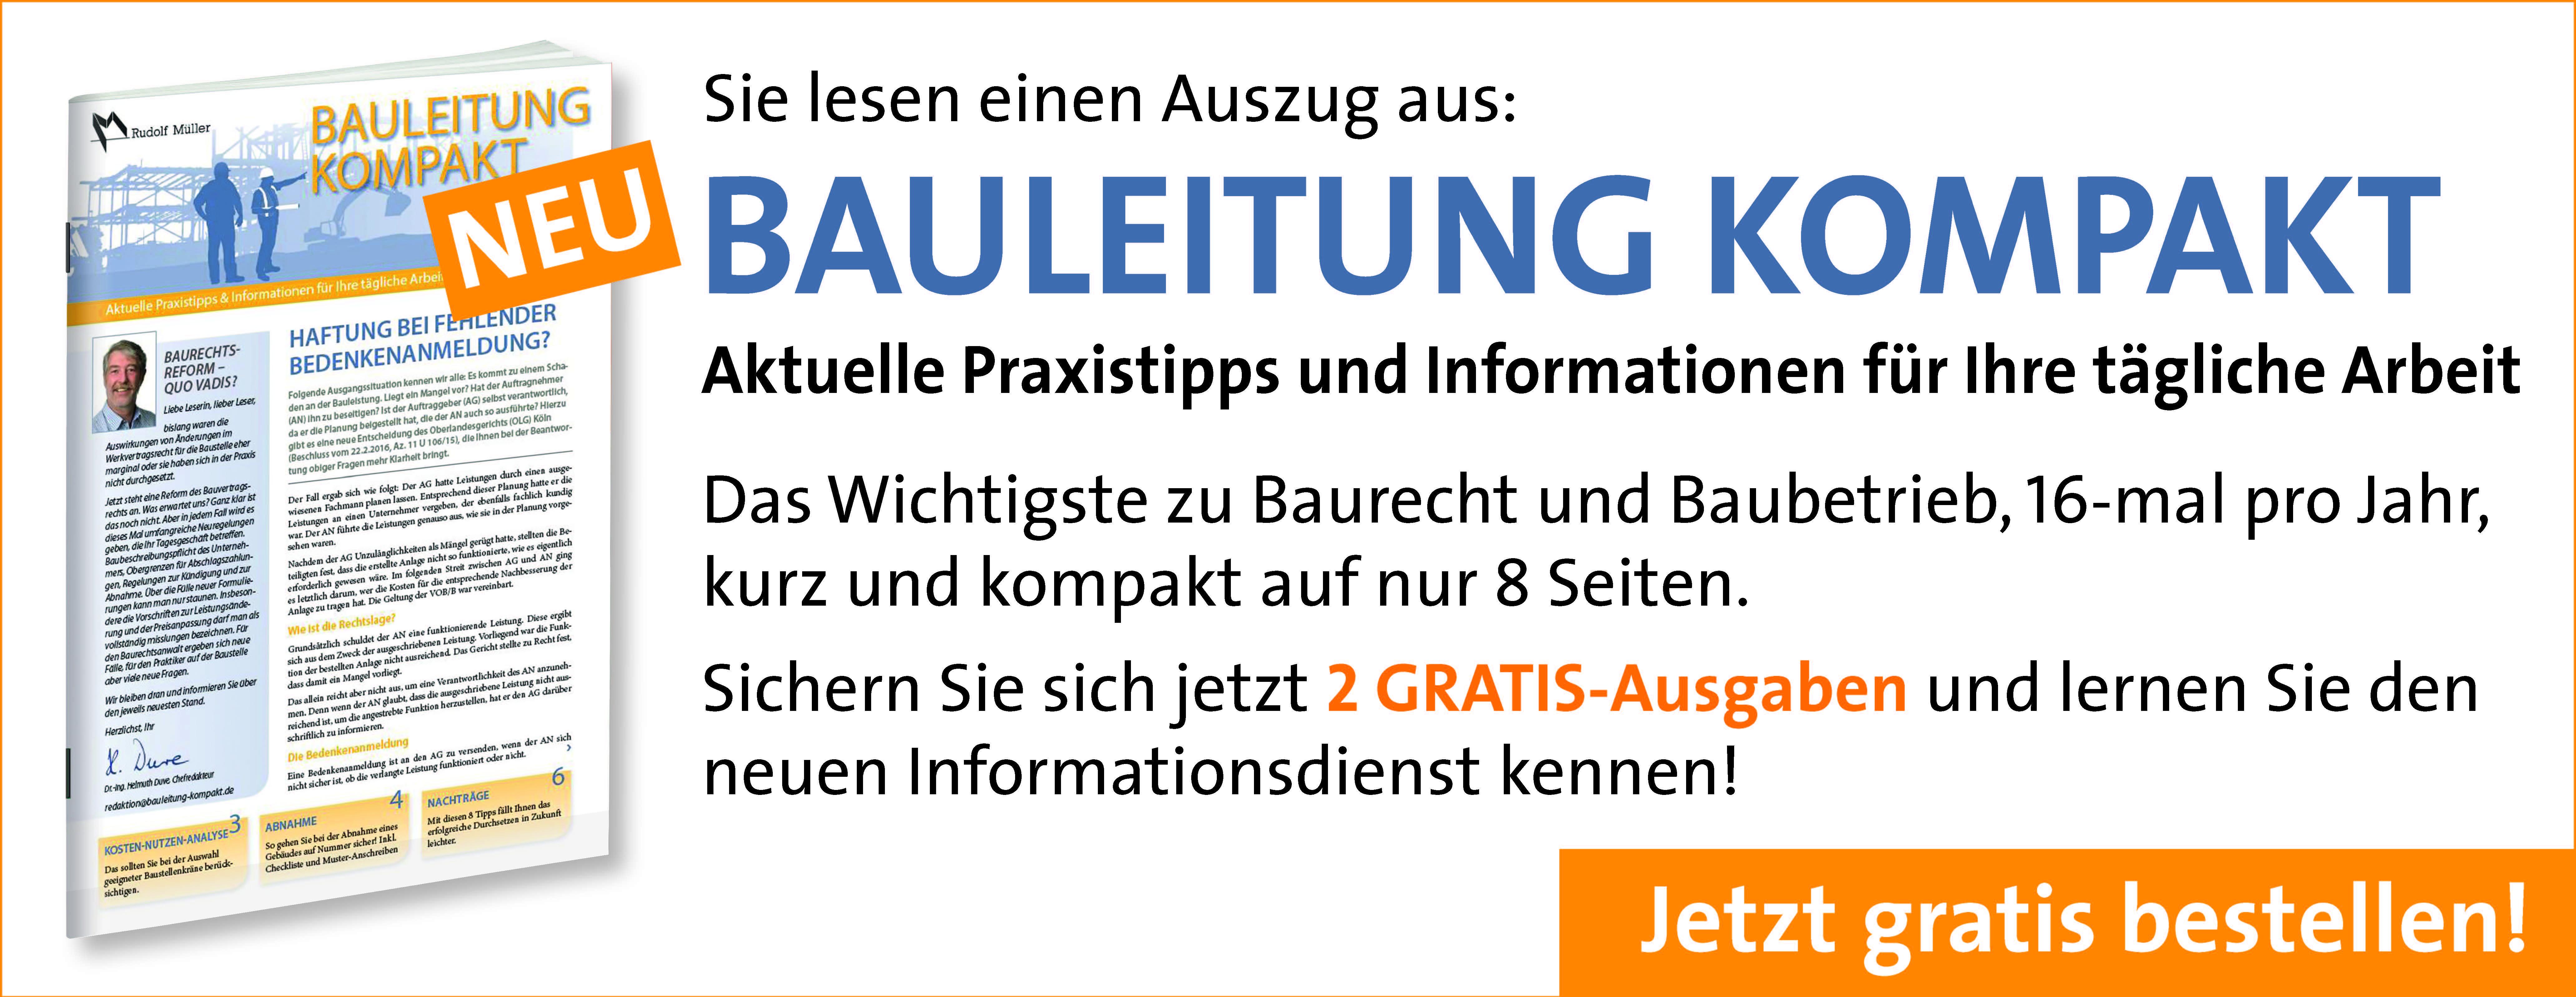 banner_bauleitung_kompakt_473x183_statisch